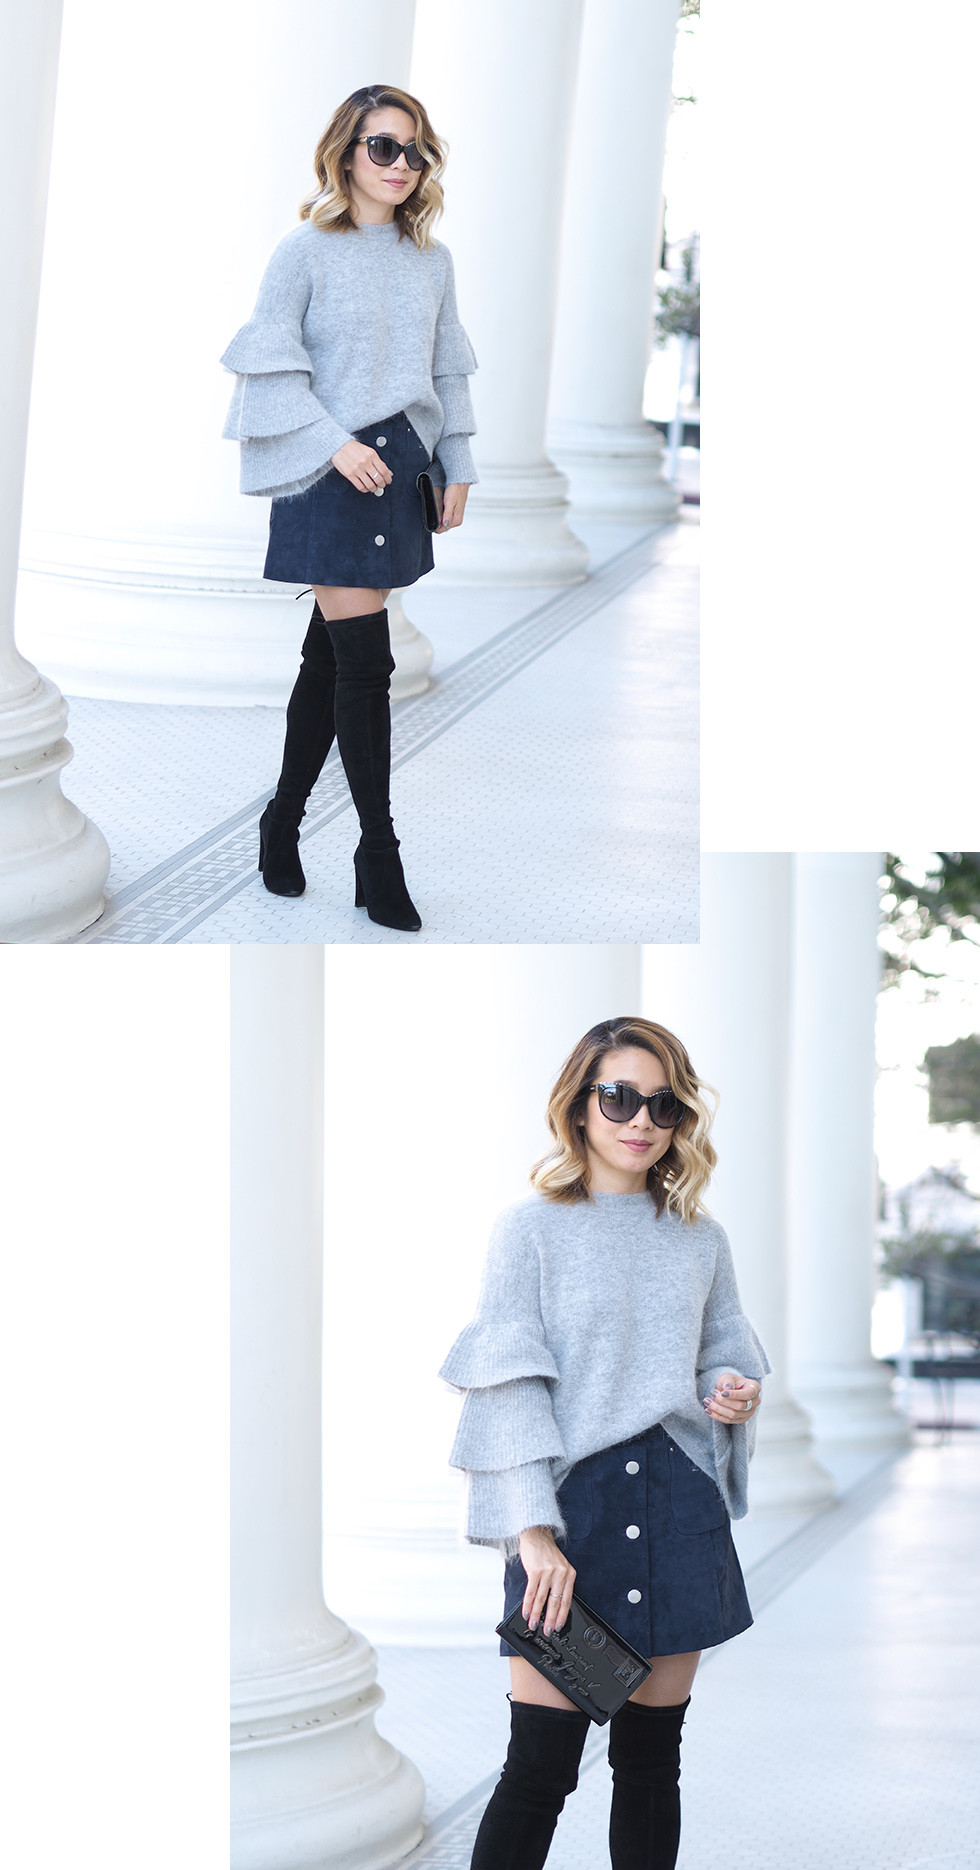 Ruffle Sleeve Sweater | Lam in Louboutins